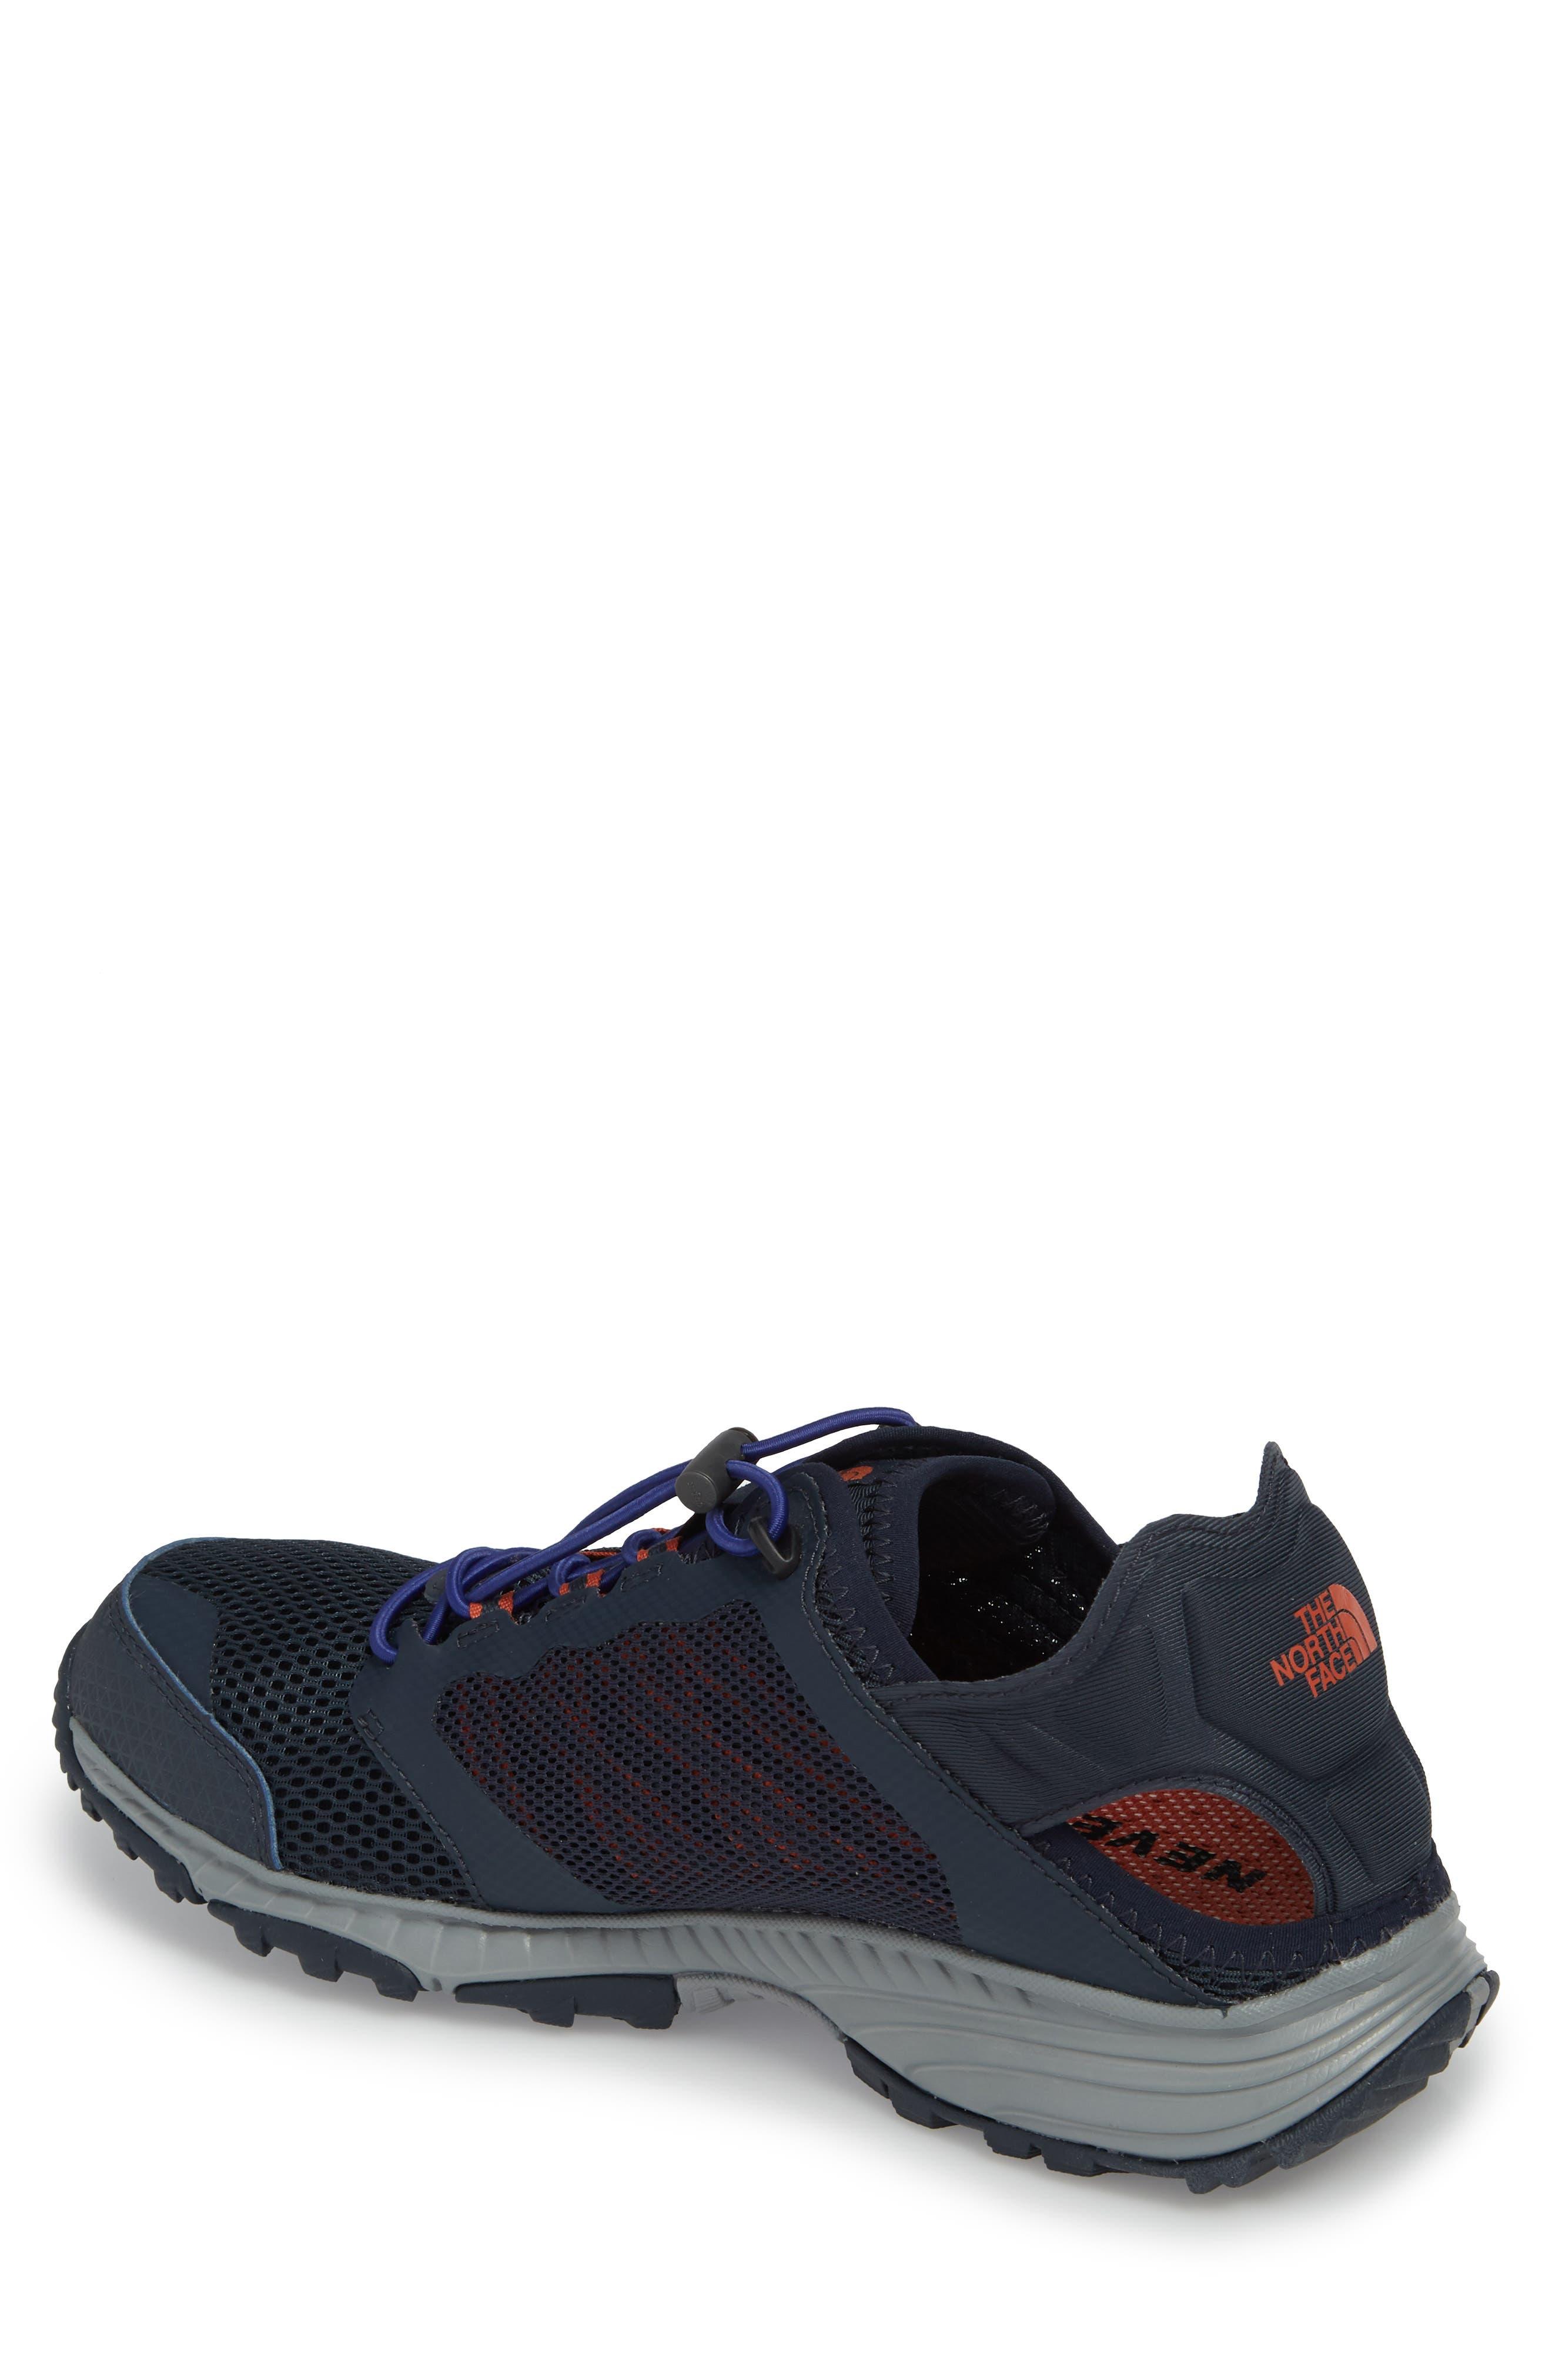 Litewave Amphibious II Collapsible Sneaker,                             Alternate thumbnail 2, color,                             Urban Navy/ Brit Blue